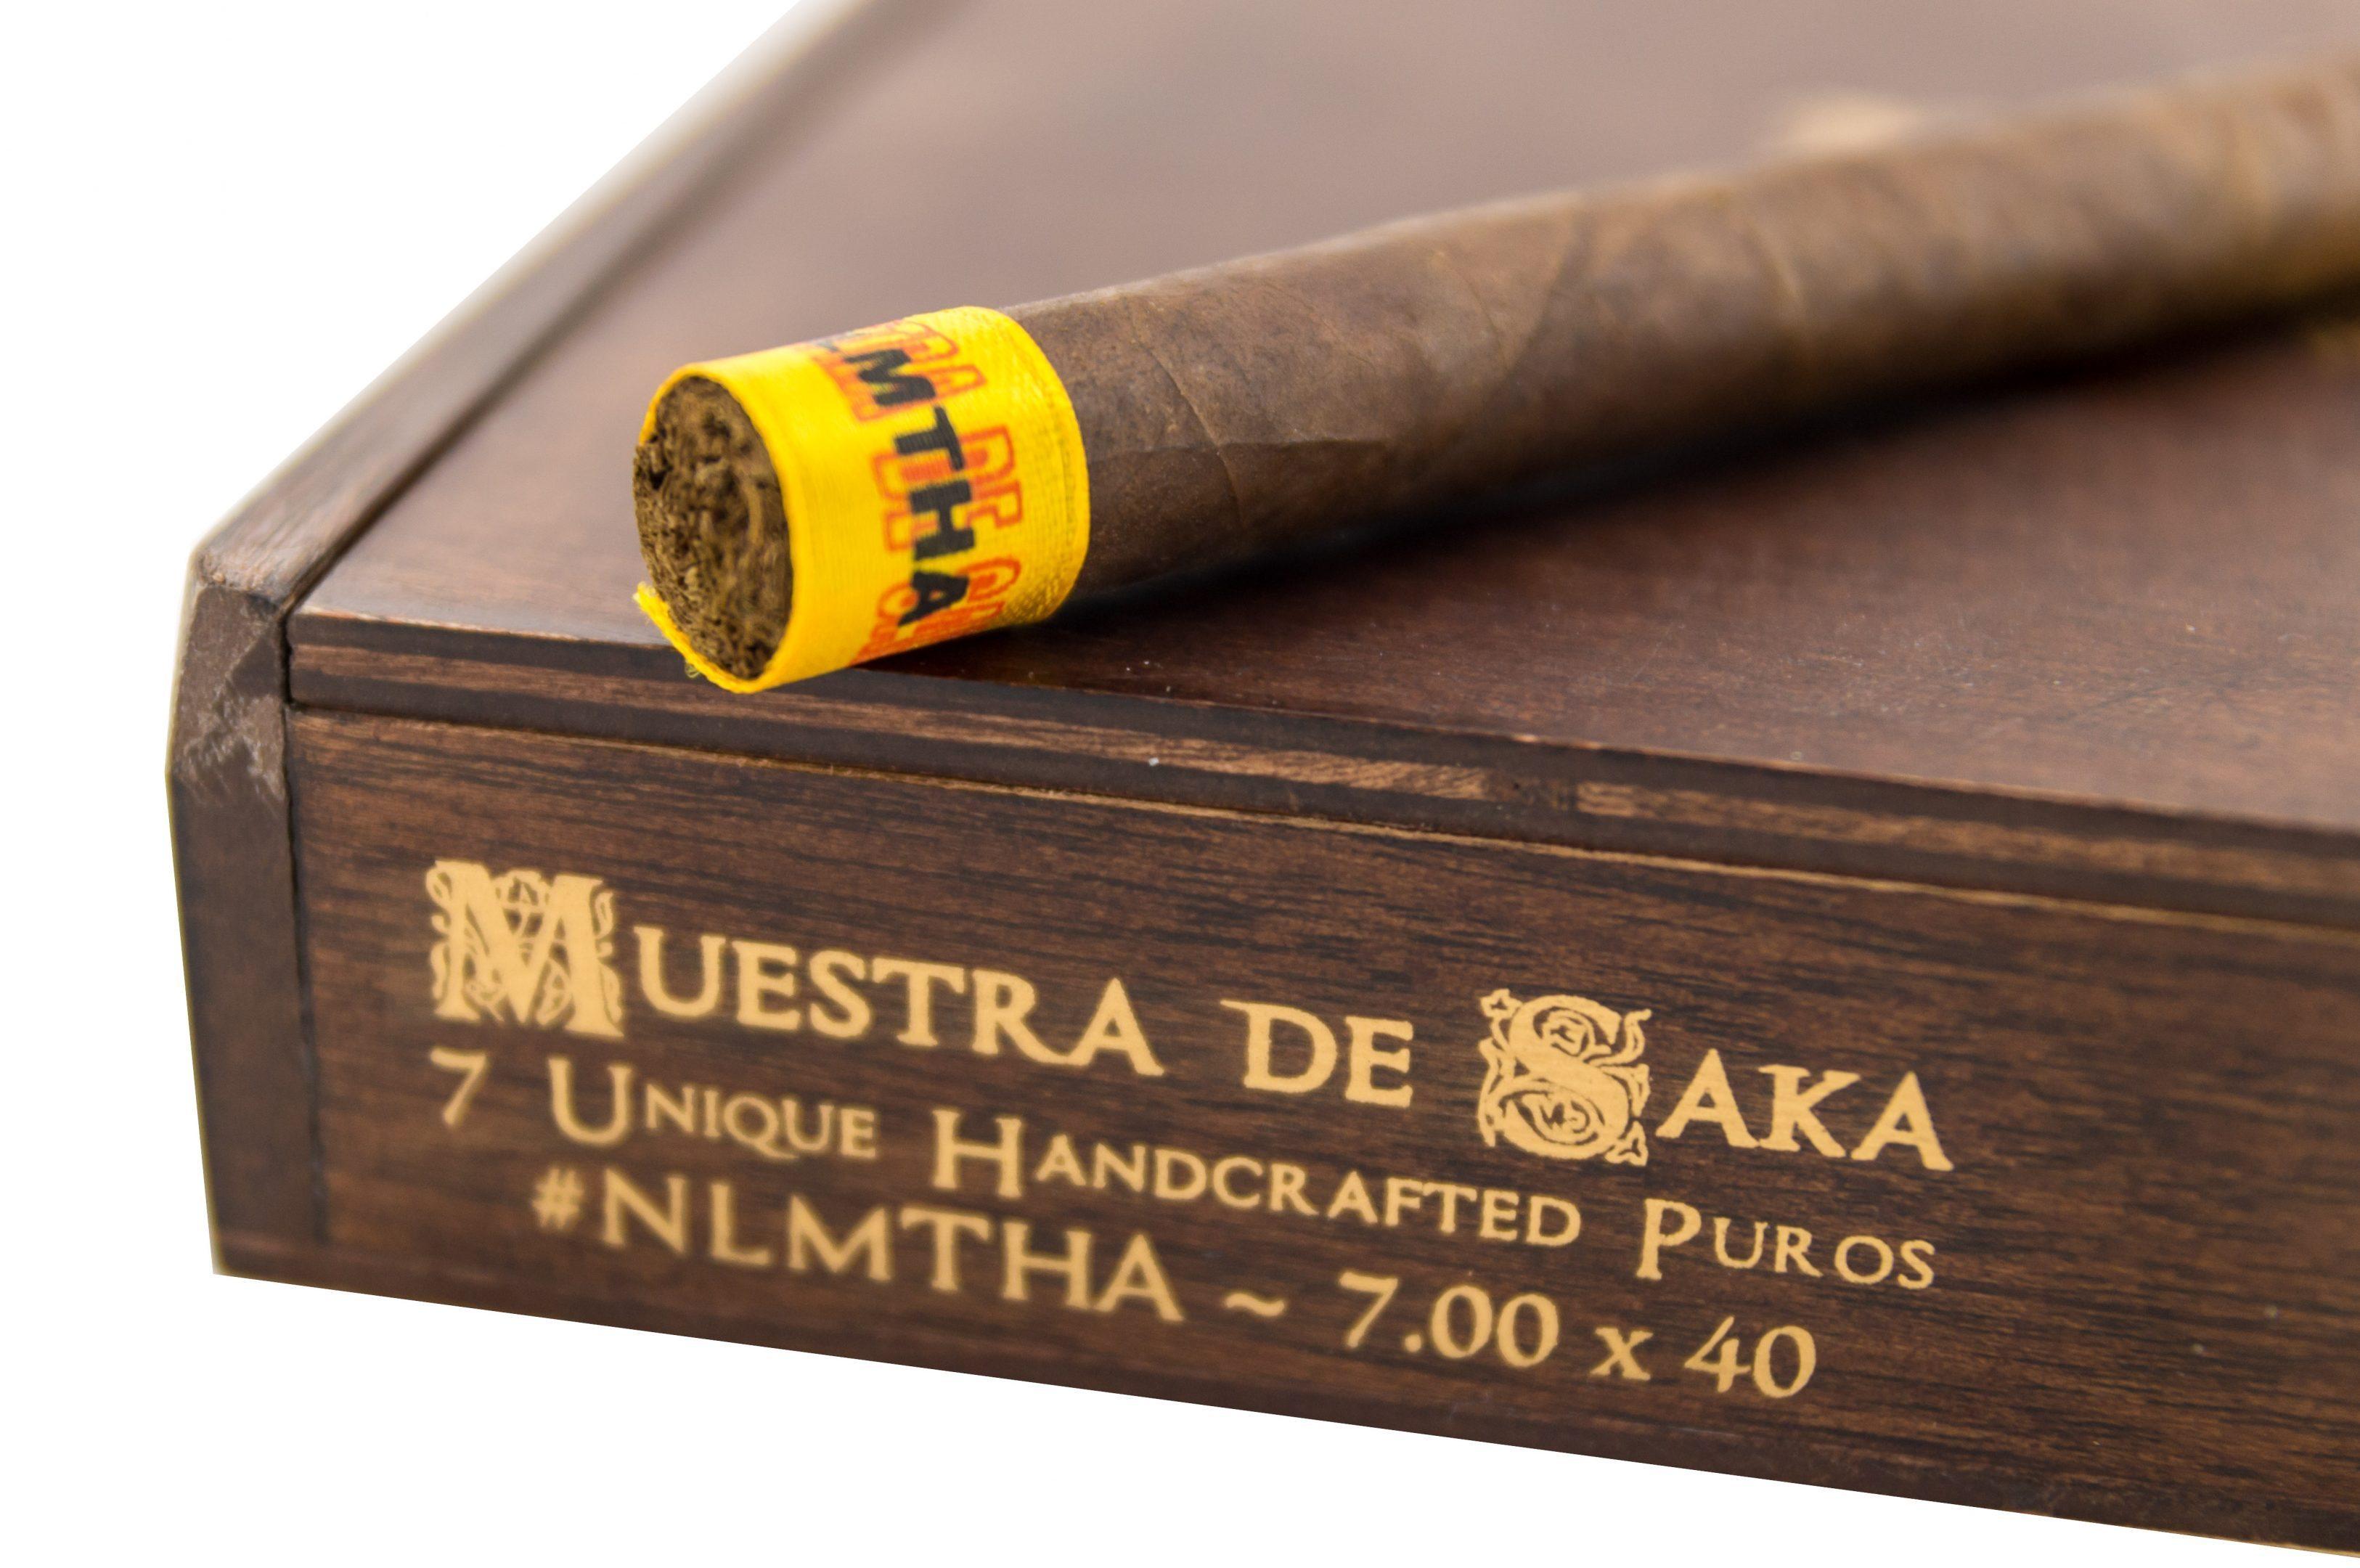 Quick Cigar Review: Dunbarton Tobacco & Trust | Muestra de Saka #NLMTHA